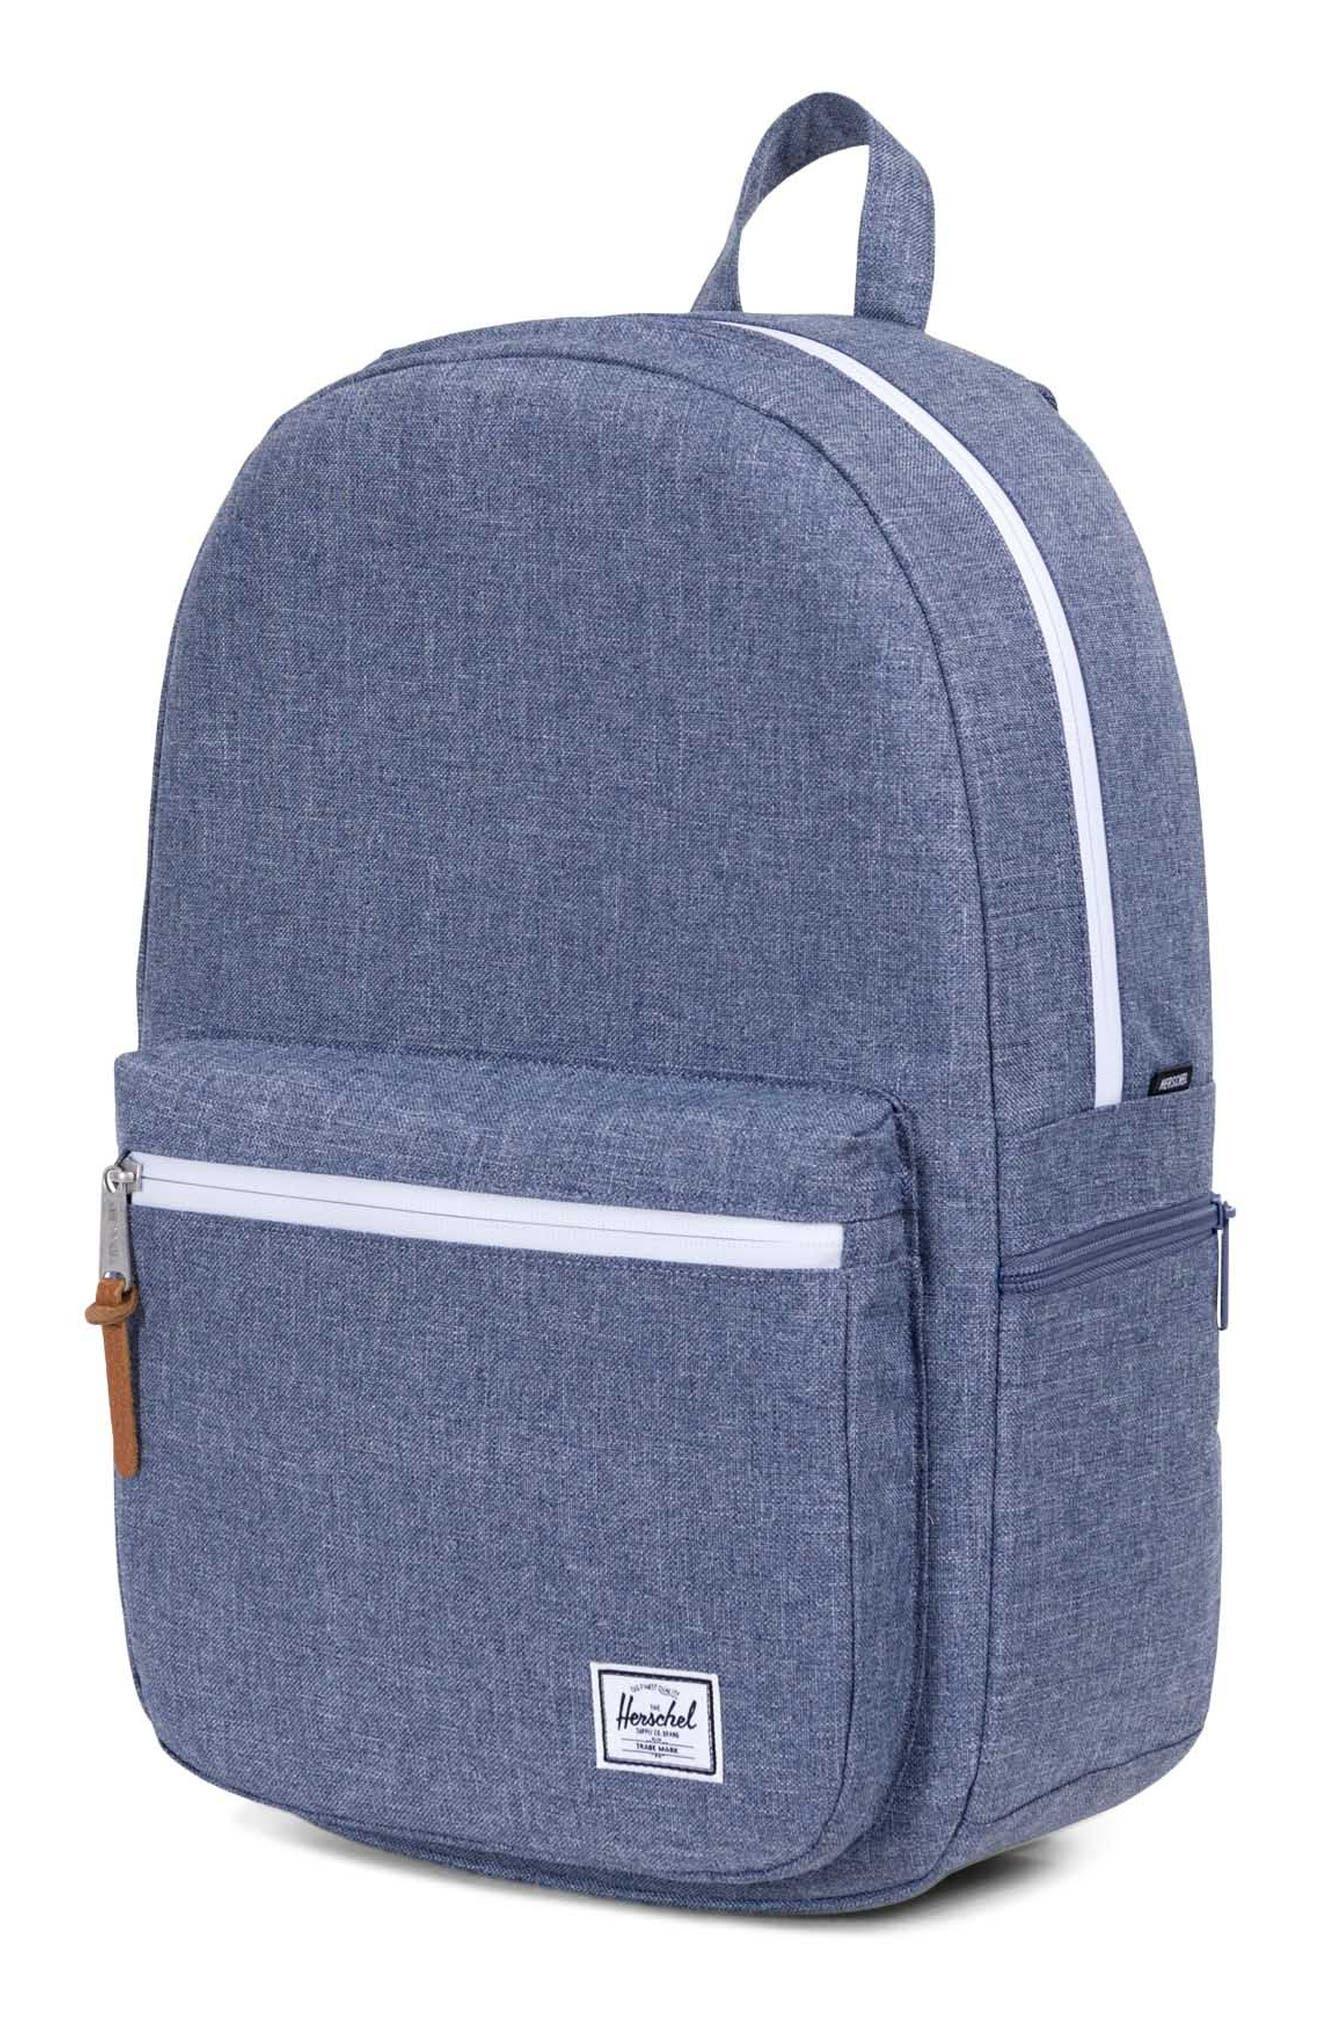 Harrison Backpack,                             Alternate thumbnail 12, color,